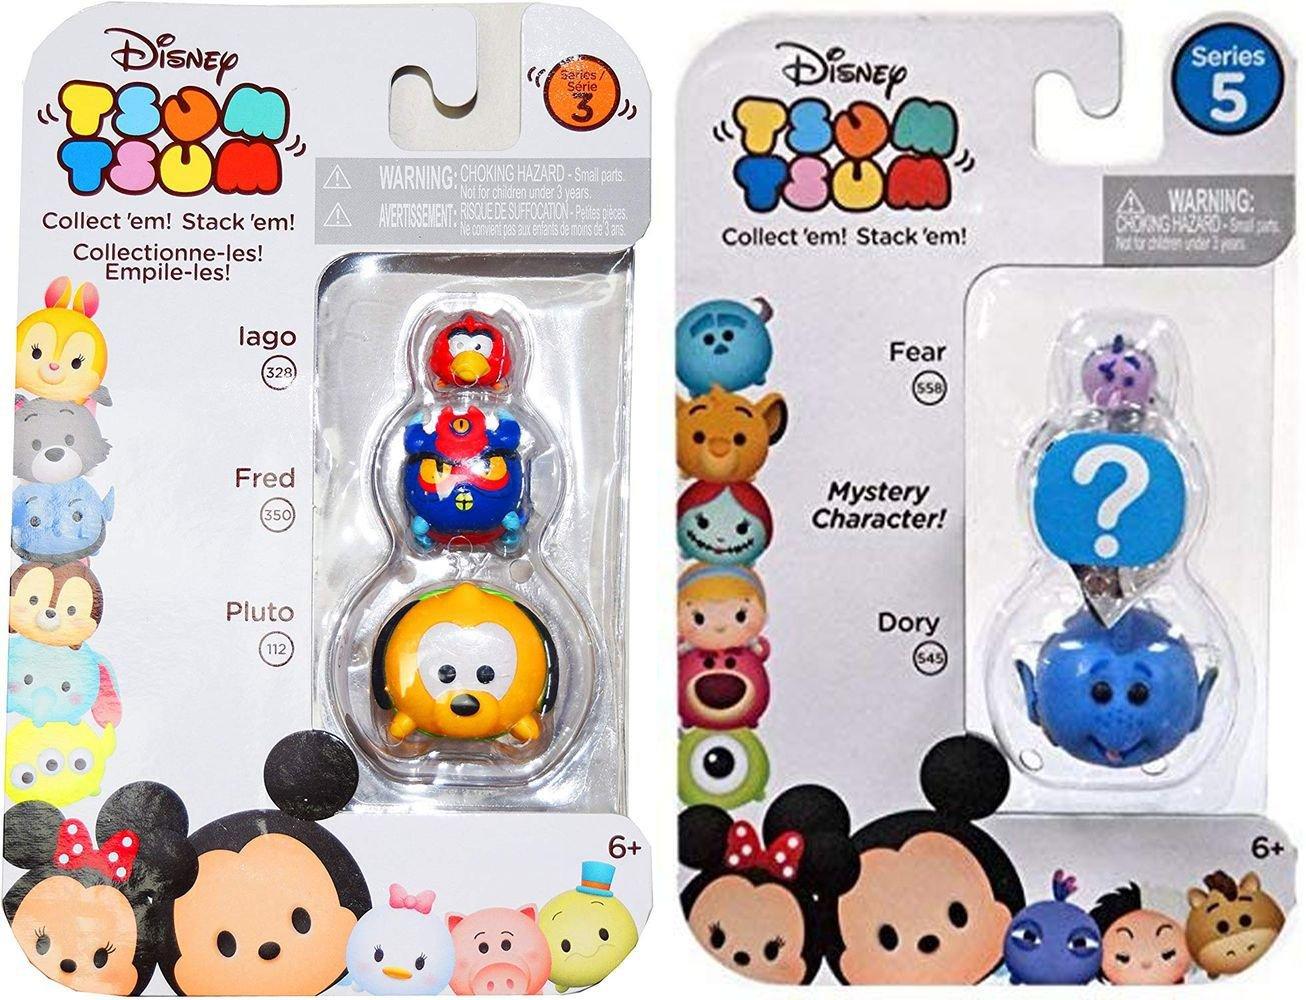 Disney Tsum Tsum Series 3 Iago, Fred & Pluto 1 and Dory/HIDDEN/Fear (Set of 2) - r015